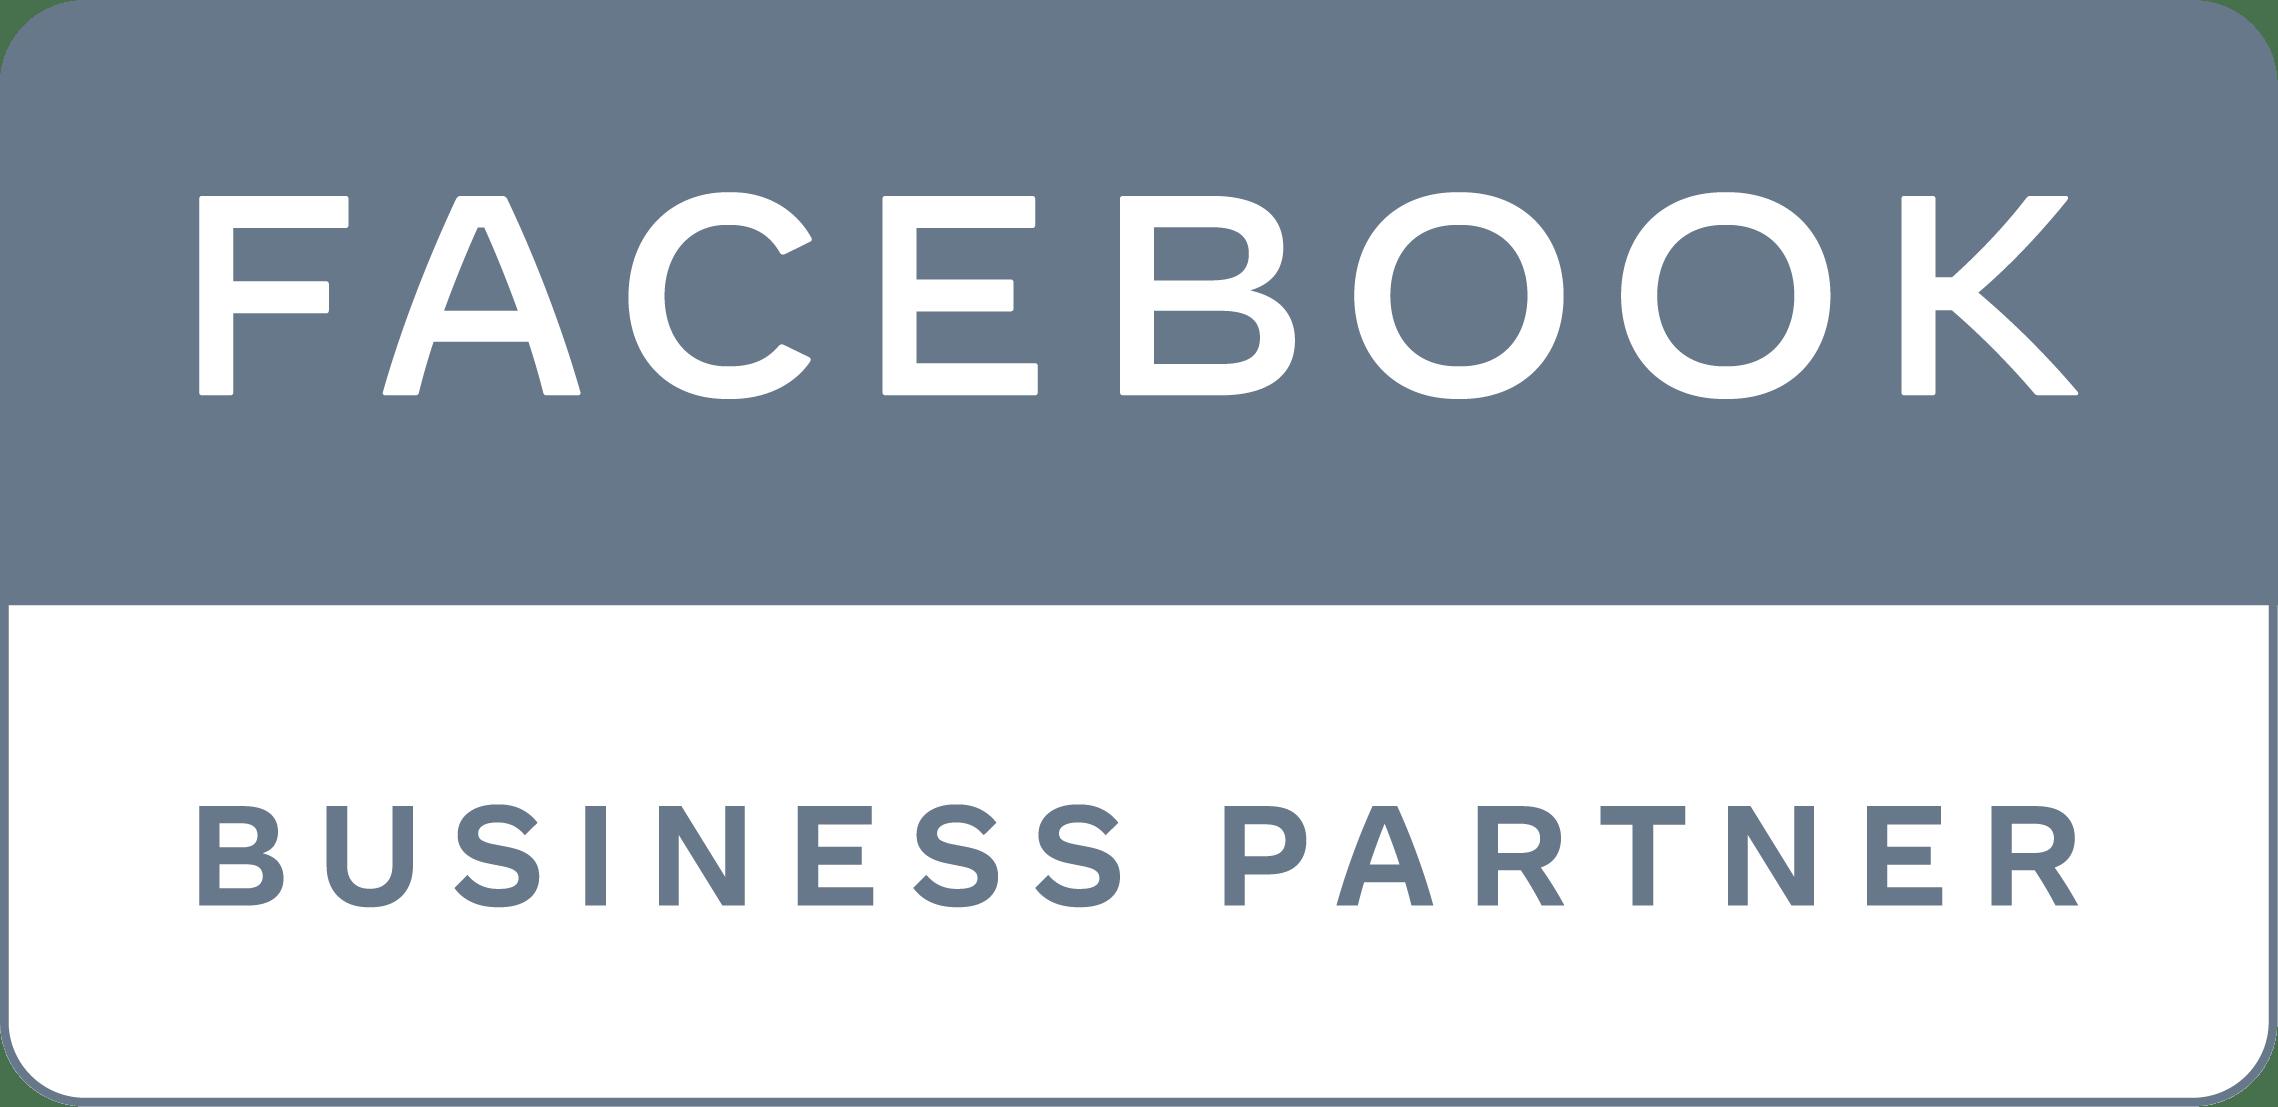 Facebook Business Partner Badge Growth Hakka